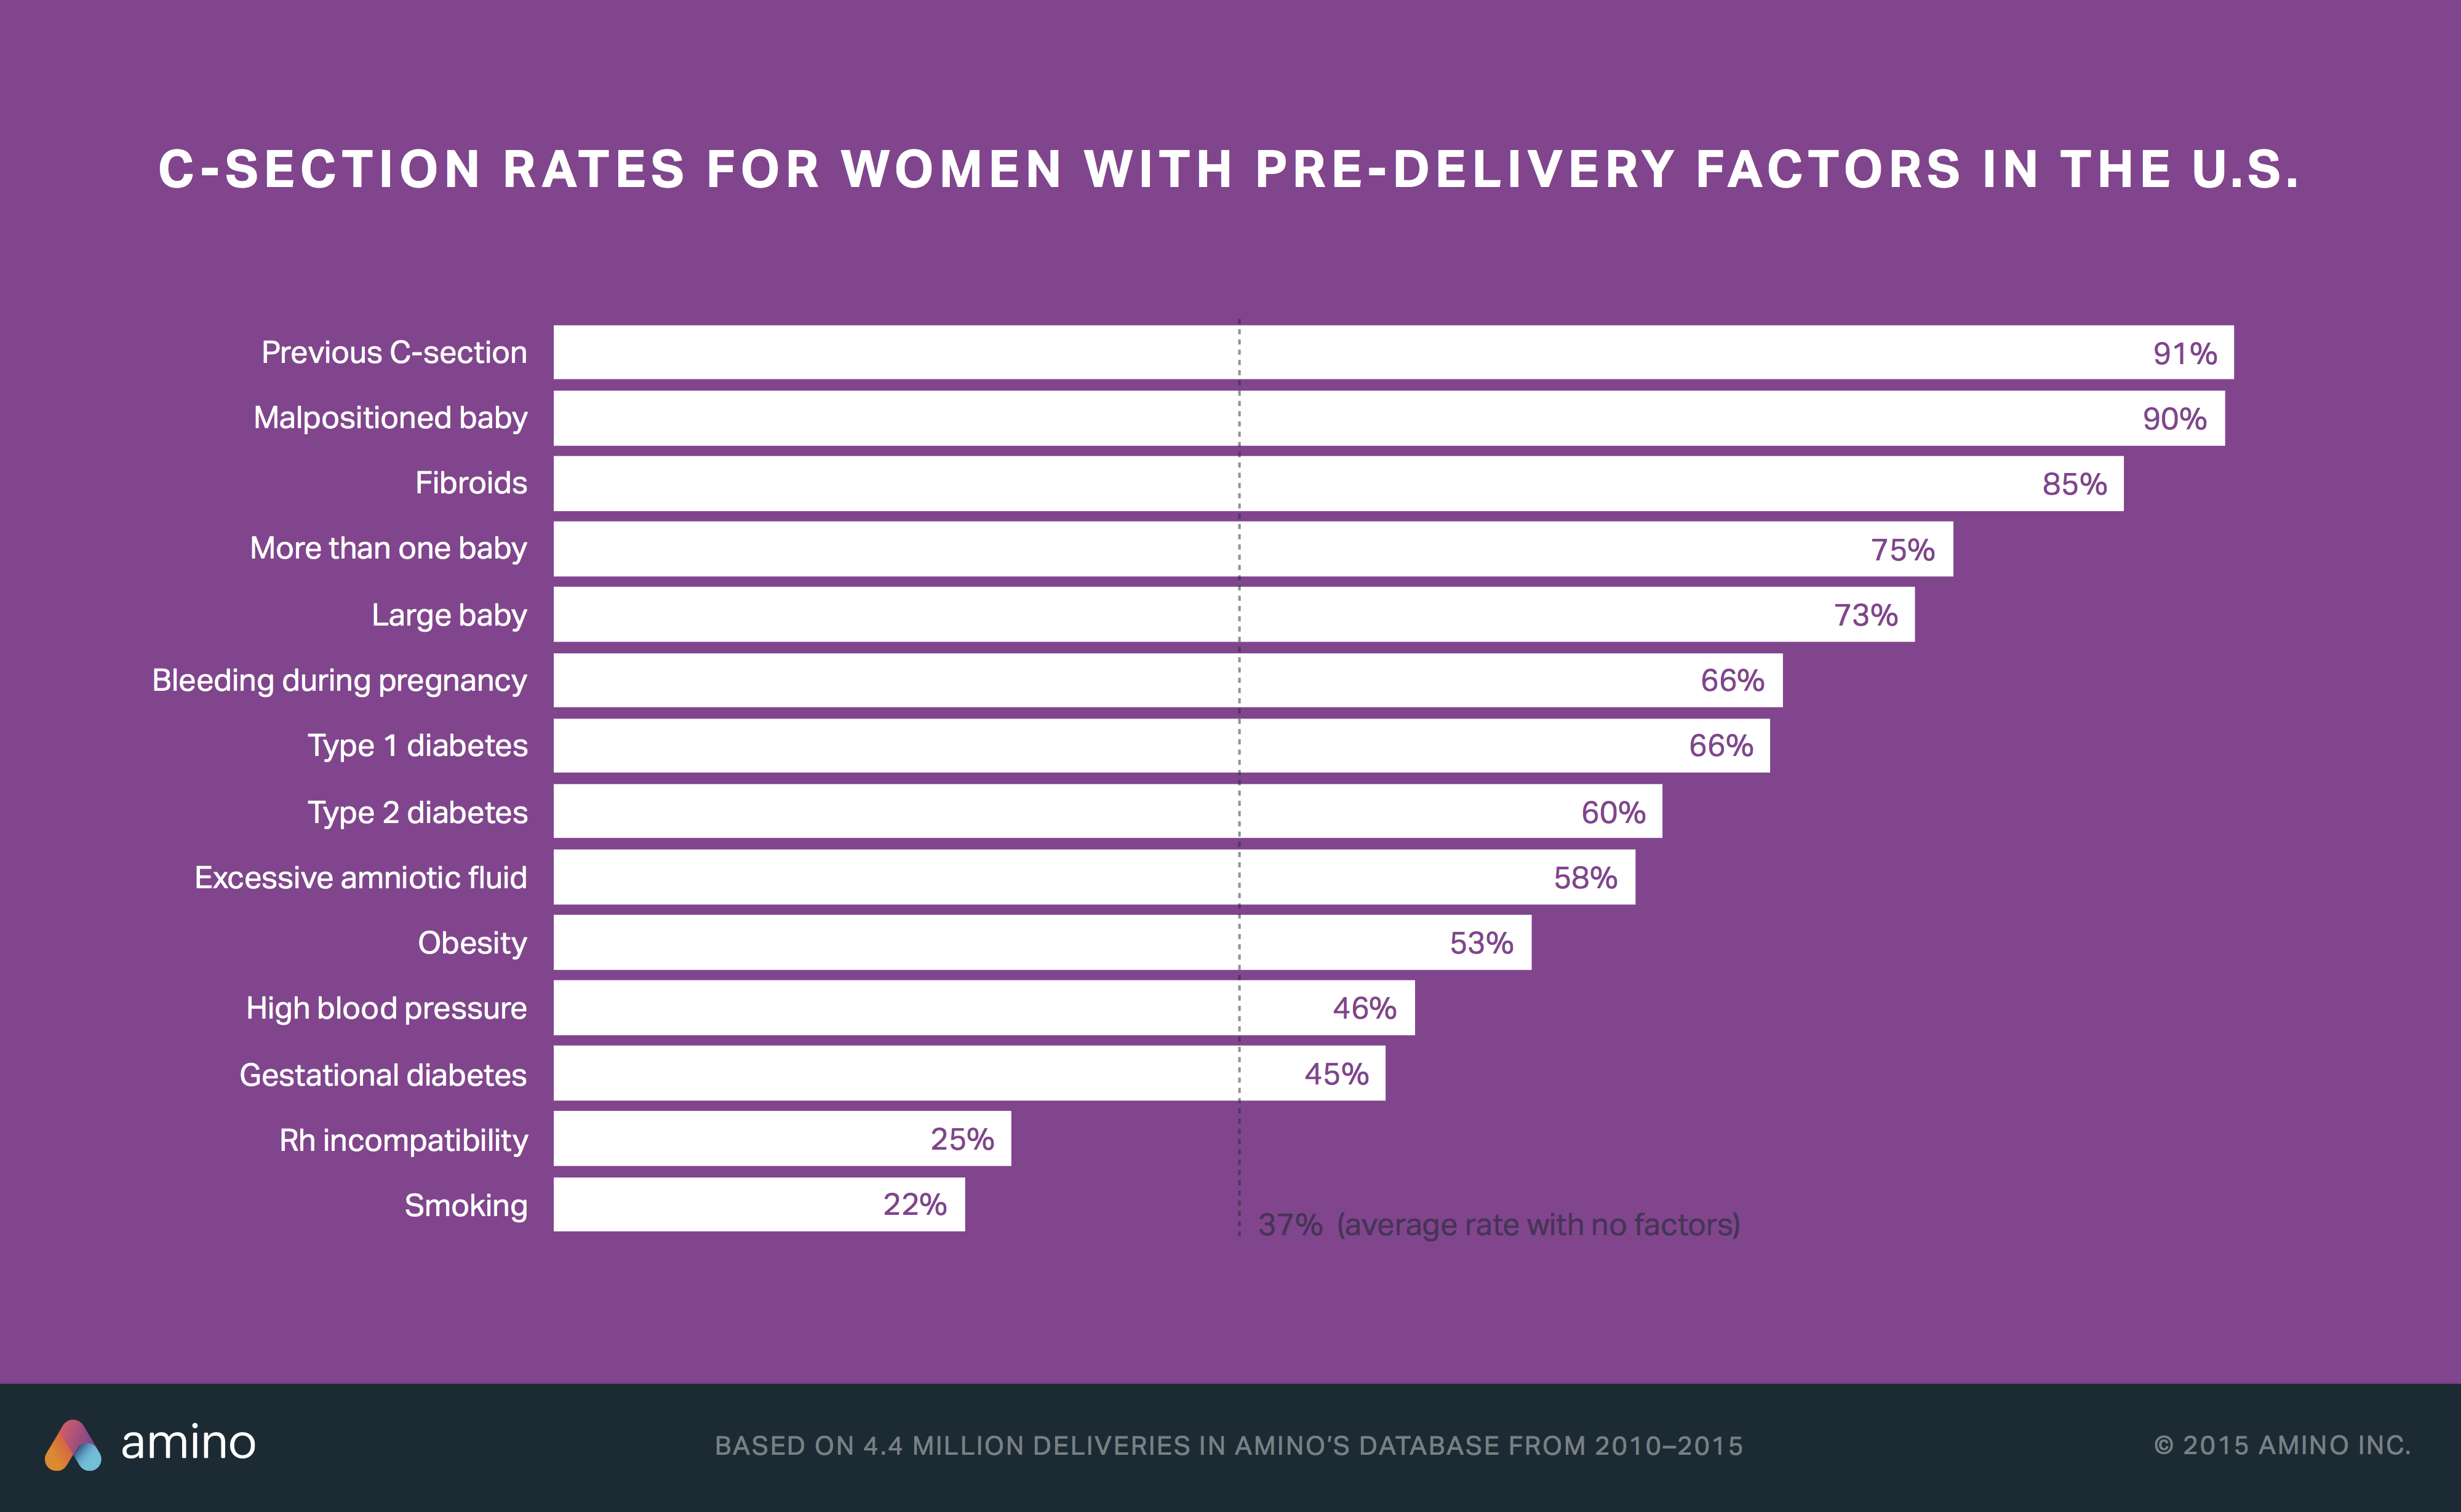 C-section rates by pre-delivery patient factors